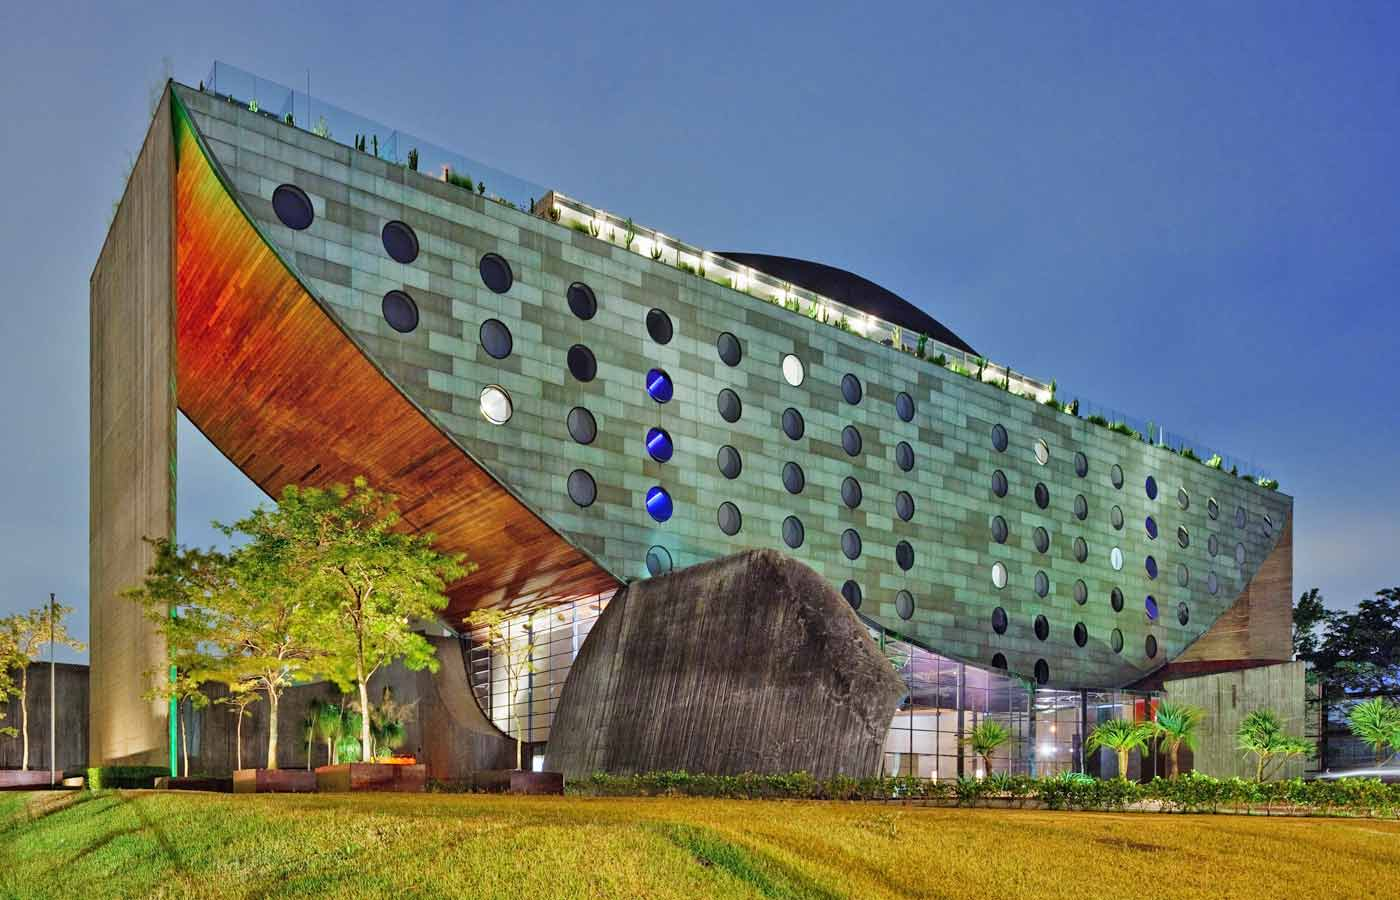 Hotel Unique - Luxury holiday to Sao Paulo, Brazil